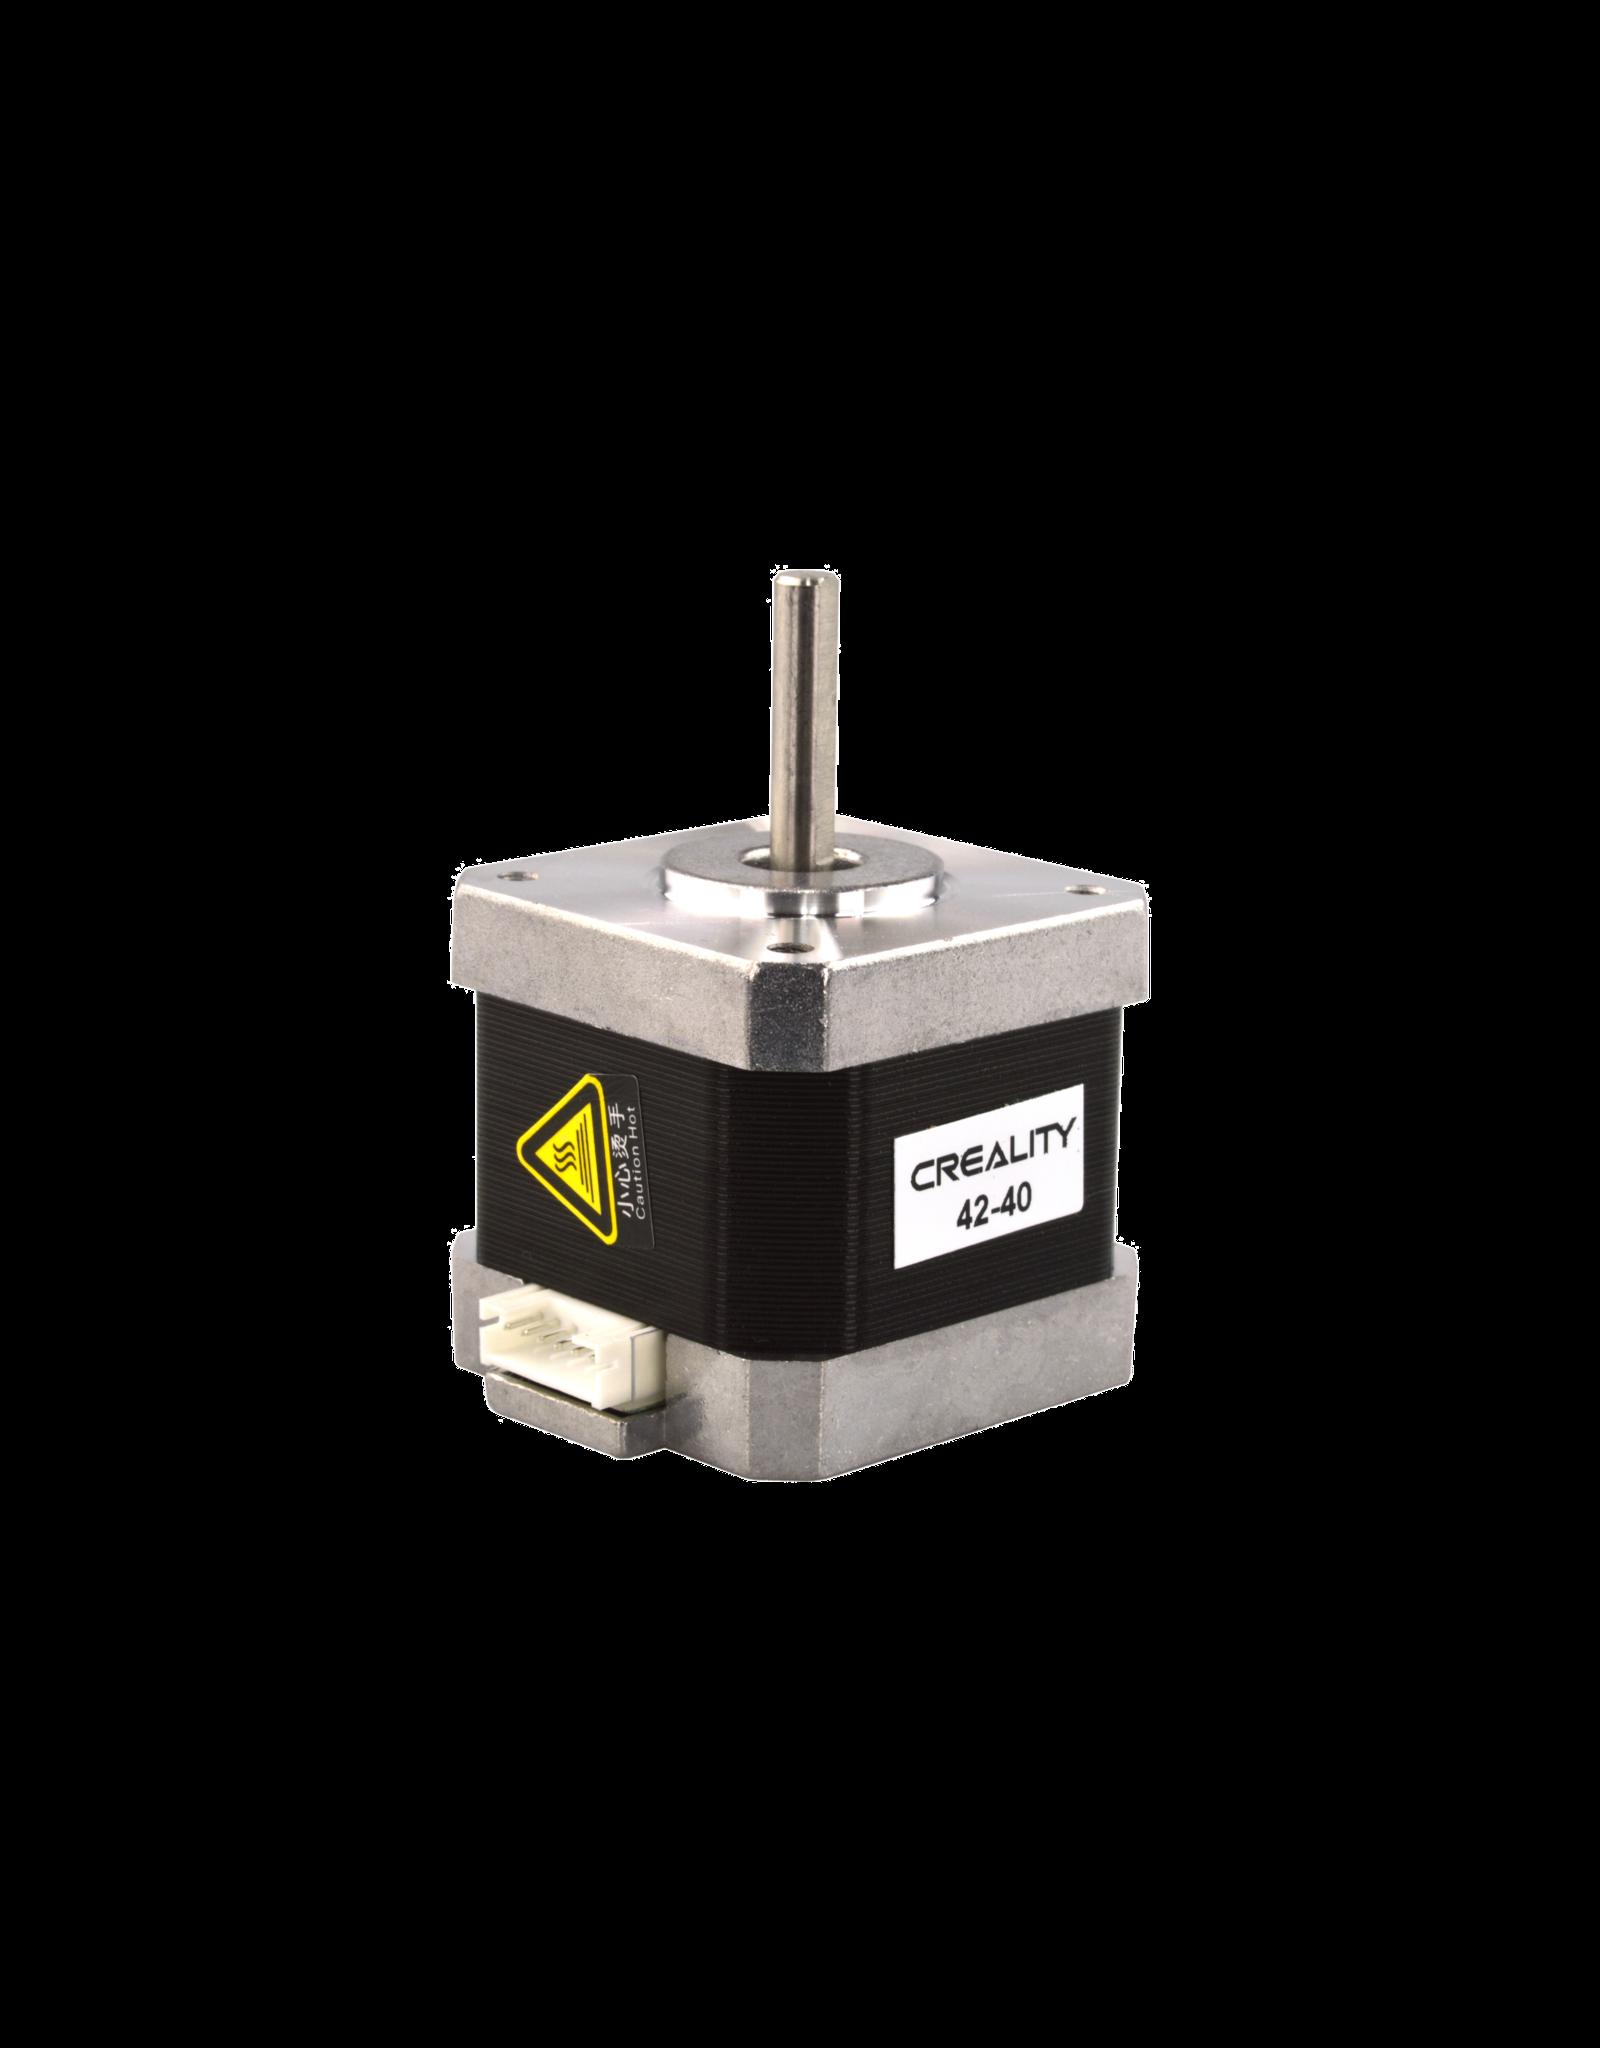 Creality/Ender Creality 3D Ender 3 V2 E Motor kit